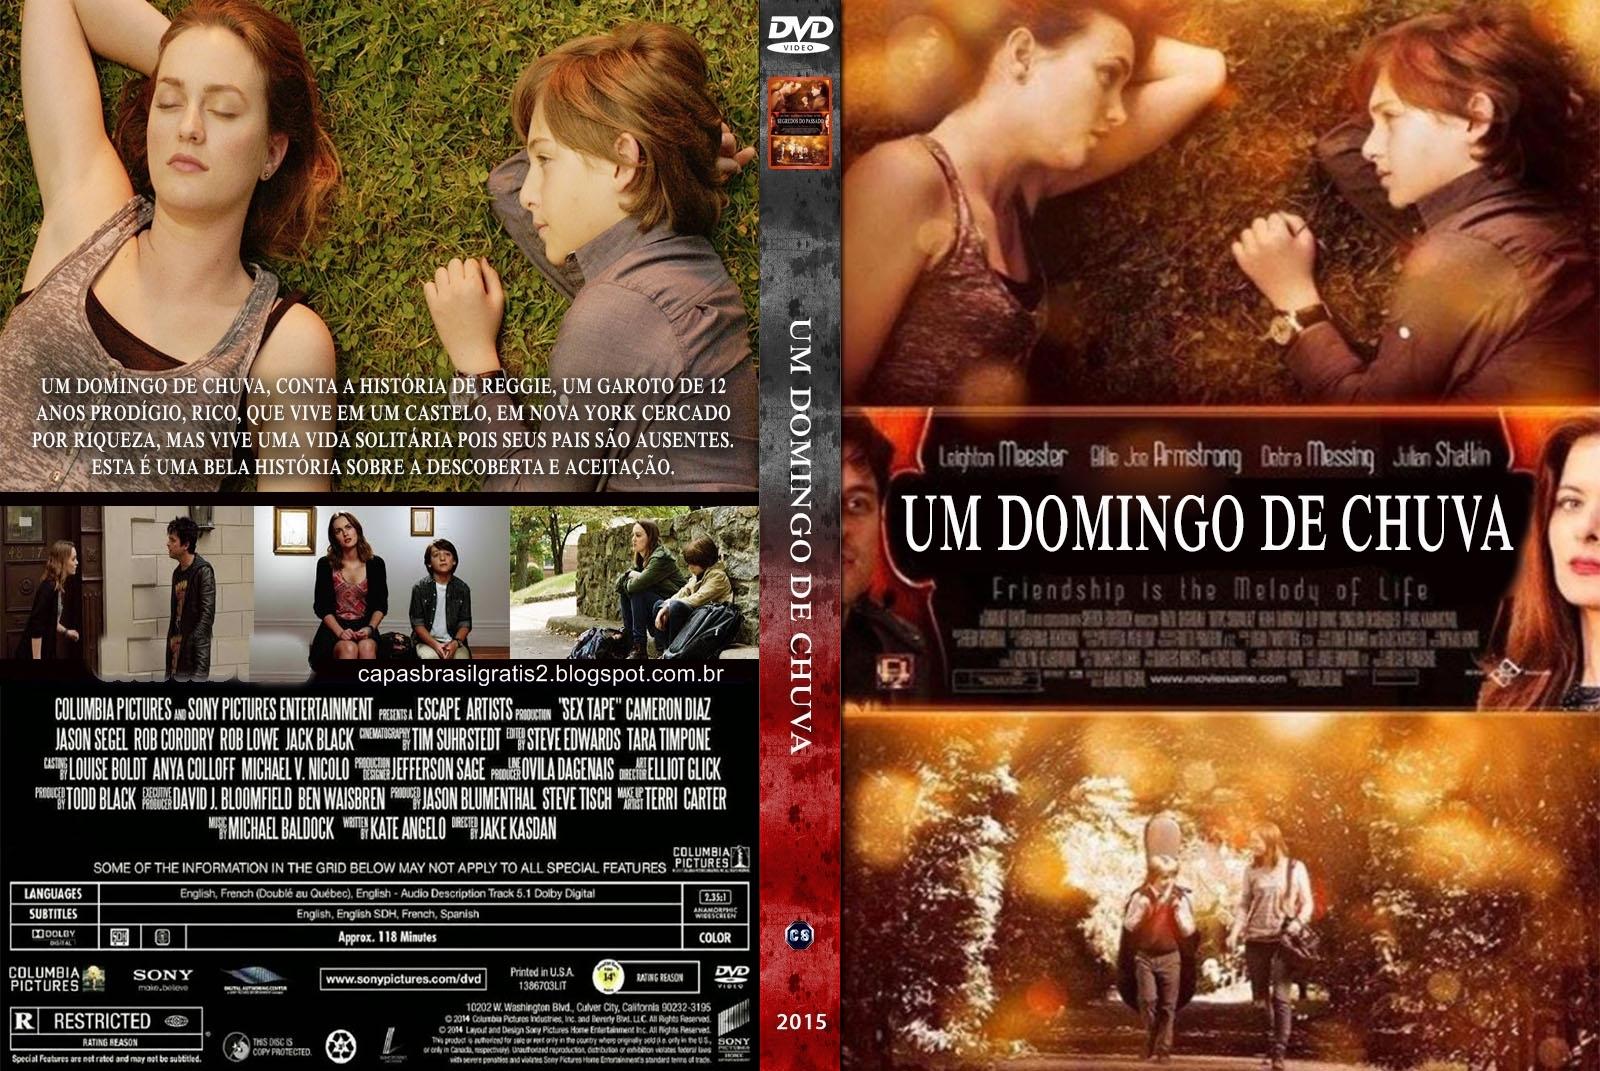 Download Um Domingo de Chuva DVDRip XviD Dual Áudio Um Domingo de Chuva